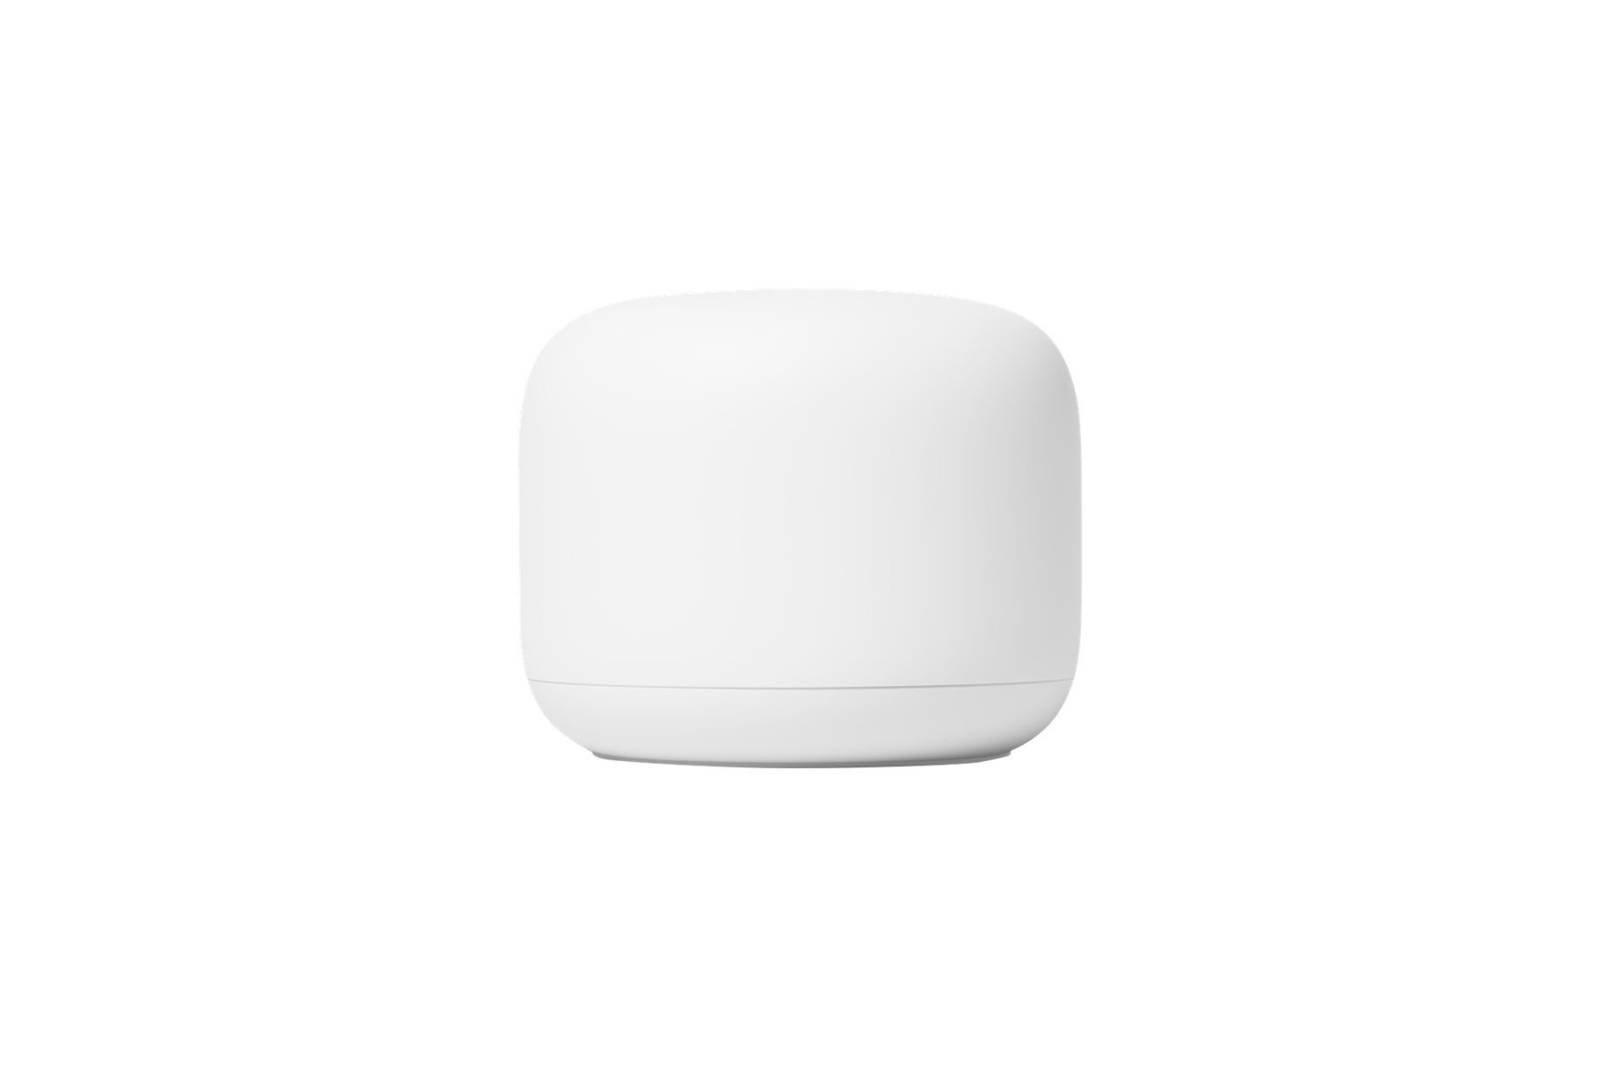 Google Nest Wifi Router (GA00595-NO)